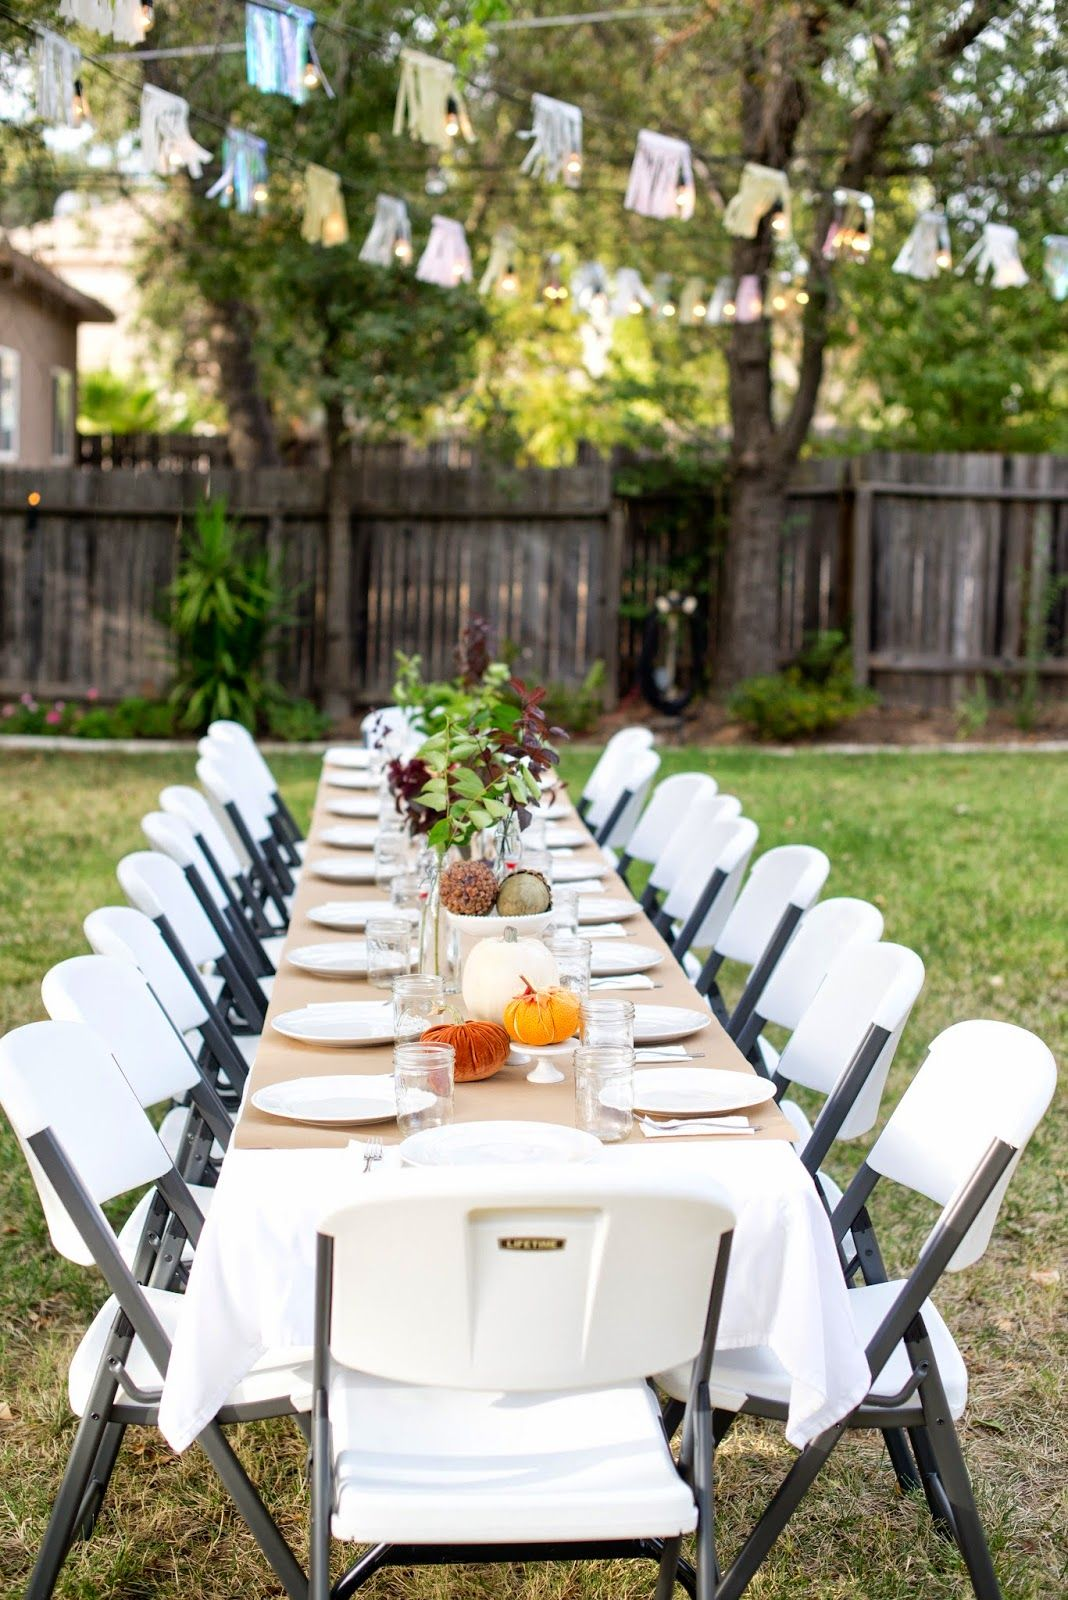 Fall Backyard Entertaining Birthday Party 21st Ideas